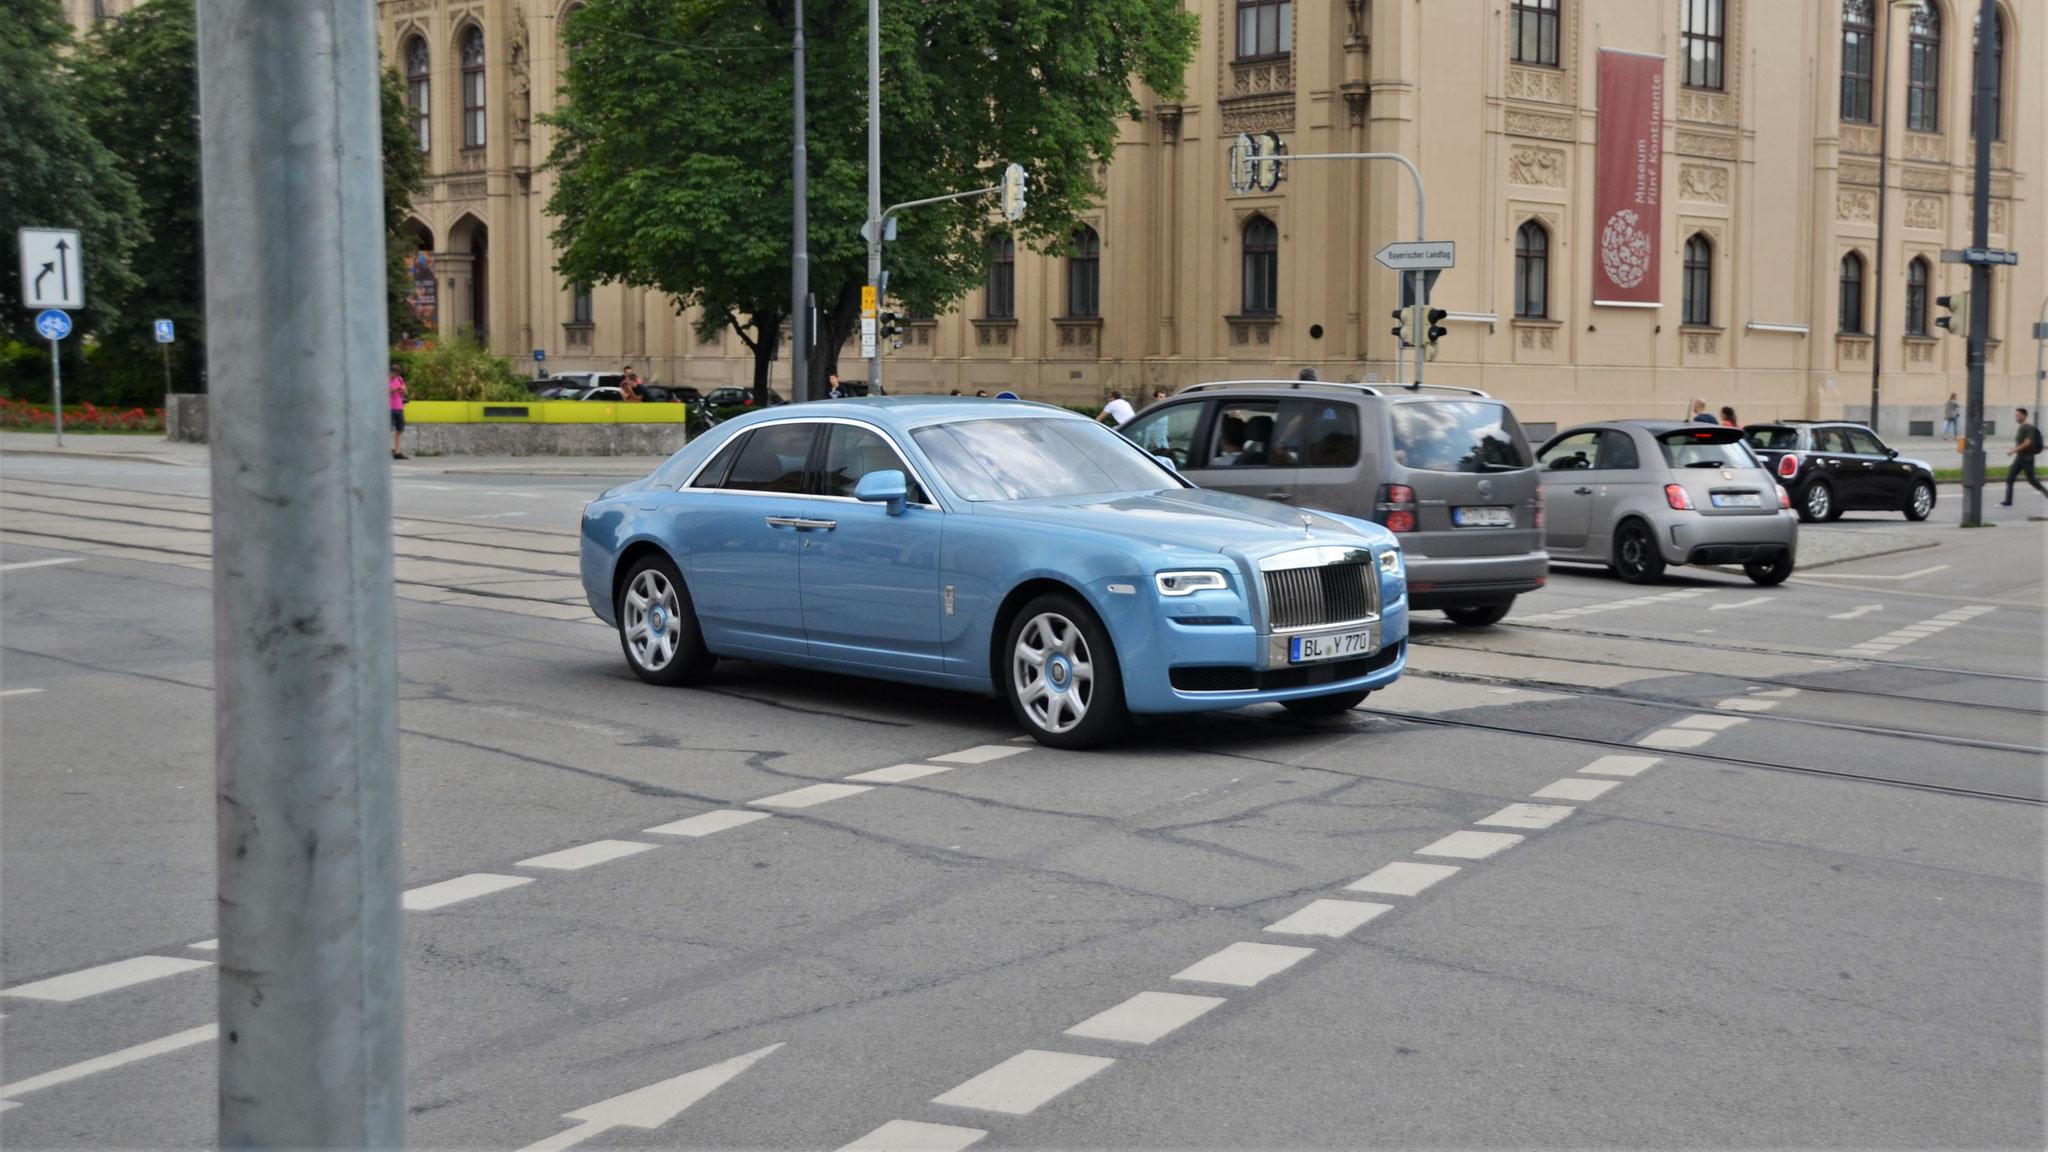 Rolls Royce Ghost Series II - BL-Y-770